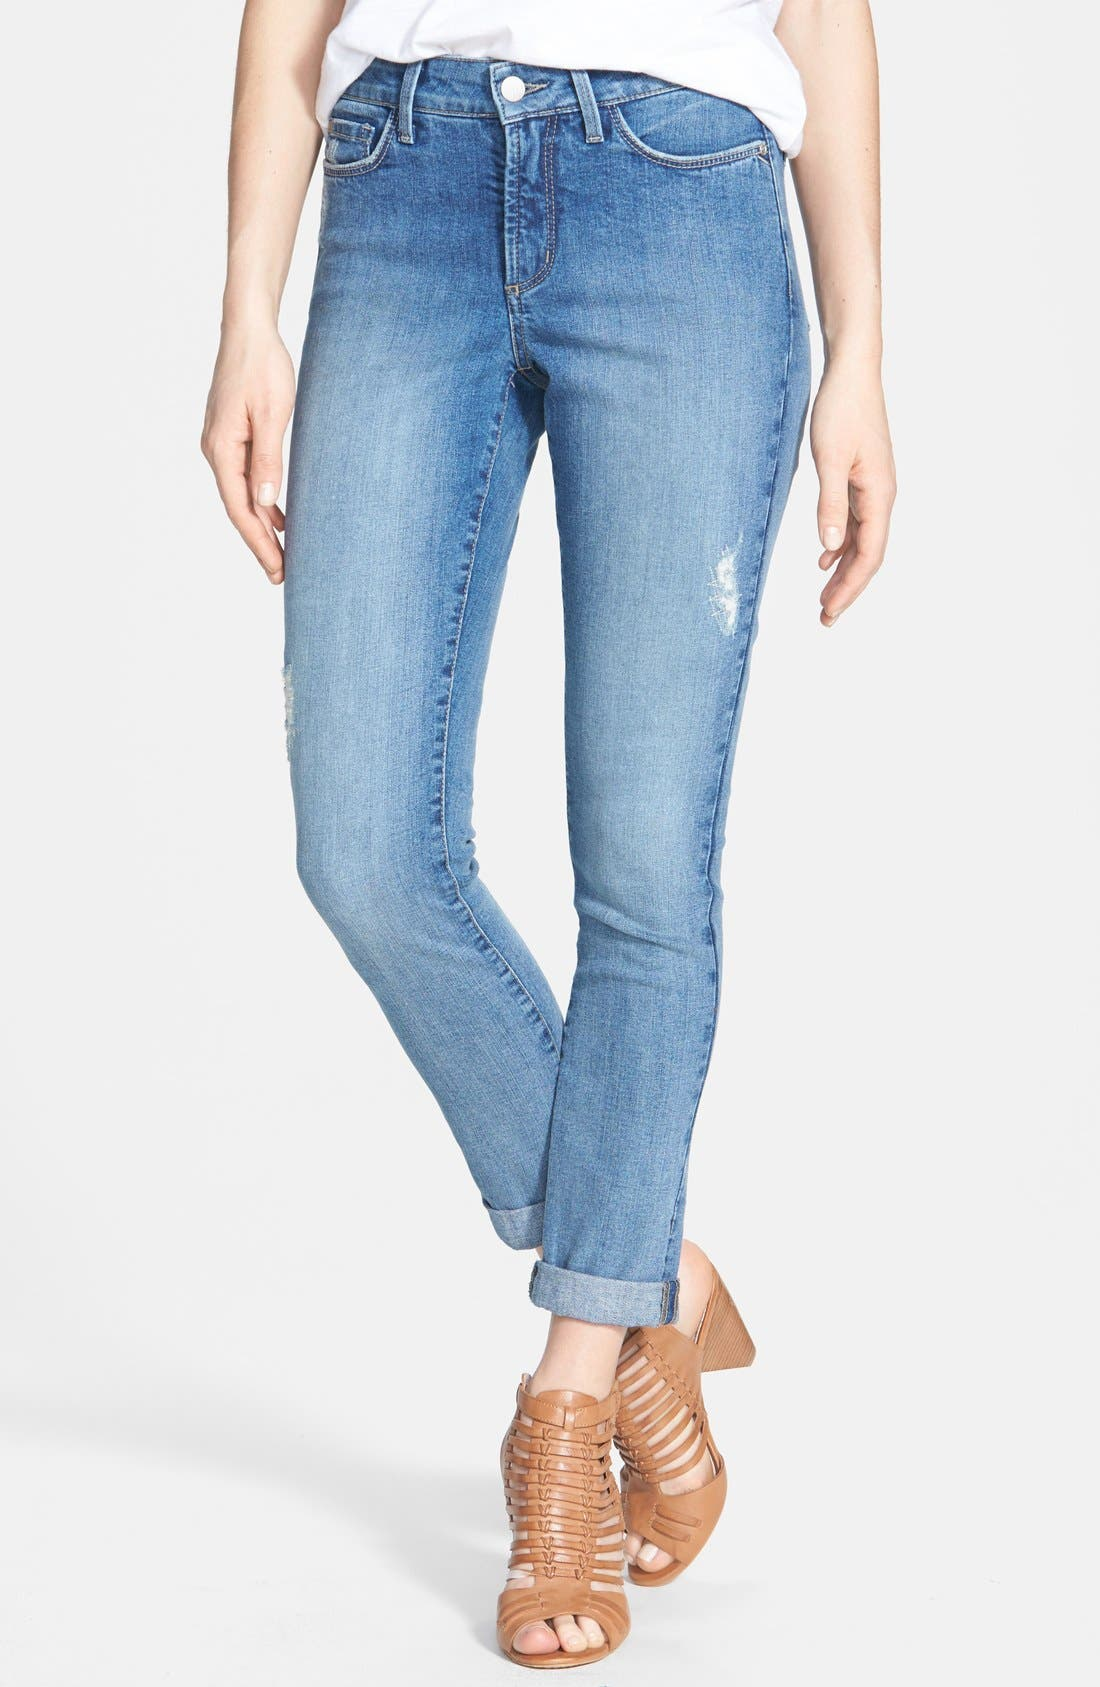 Main Image - NYDJ 'Anabelle' Stretch Skinny Jeans (Angora Lake) (Regular & Petite)